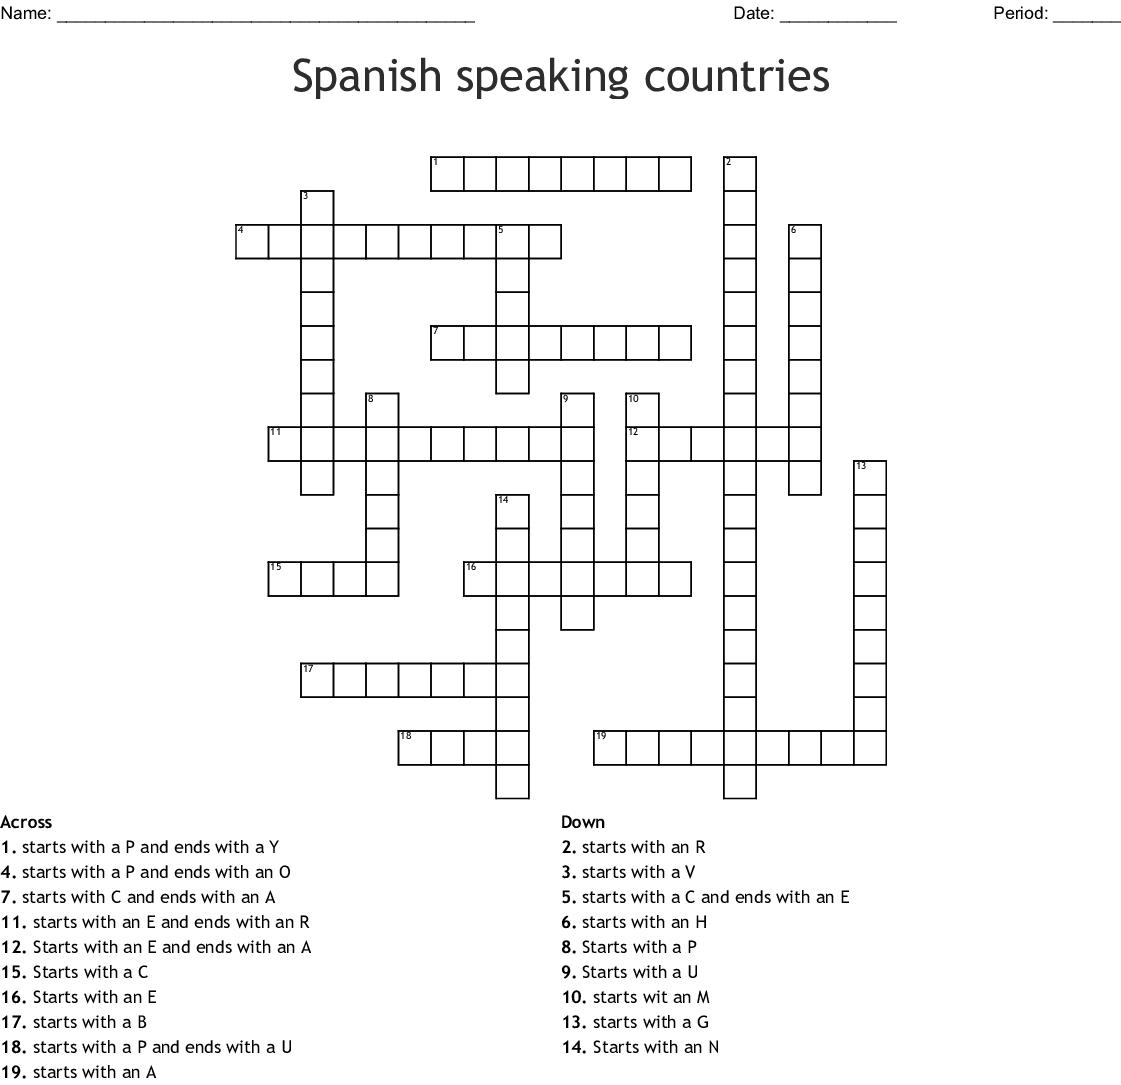 Spanish Speaking Countries Crossword